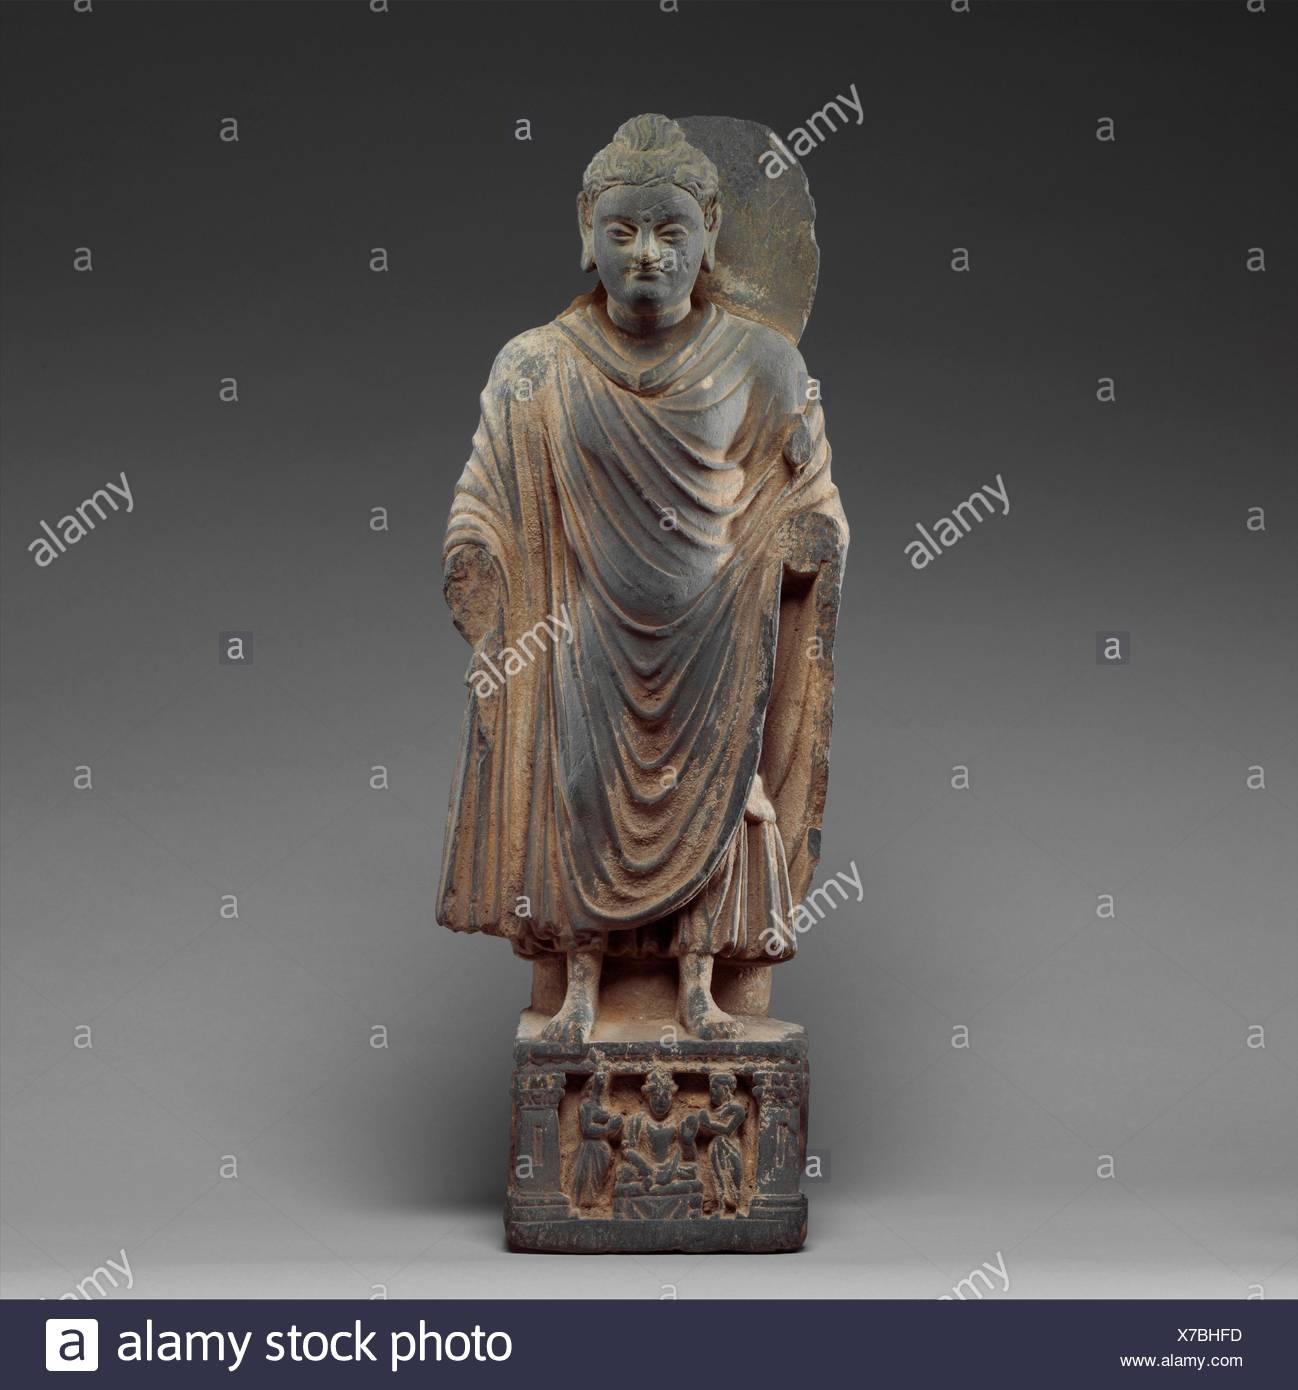 Standing Buddha. Date: ca. 3rd-4th century; Culture: Pakistan (ancient region of Gandhara); Medium: Schist; Dimensions: H. 20 in. (50.8 cm); W. 7 1/4 Stock Photo